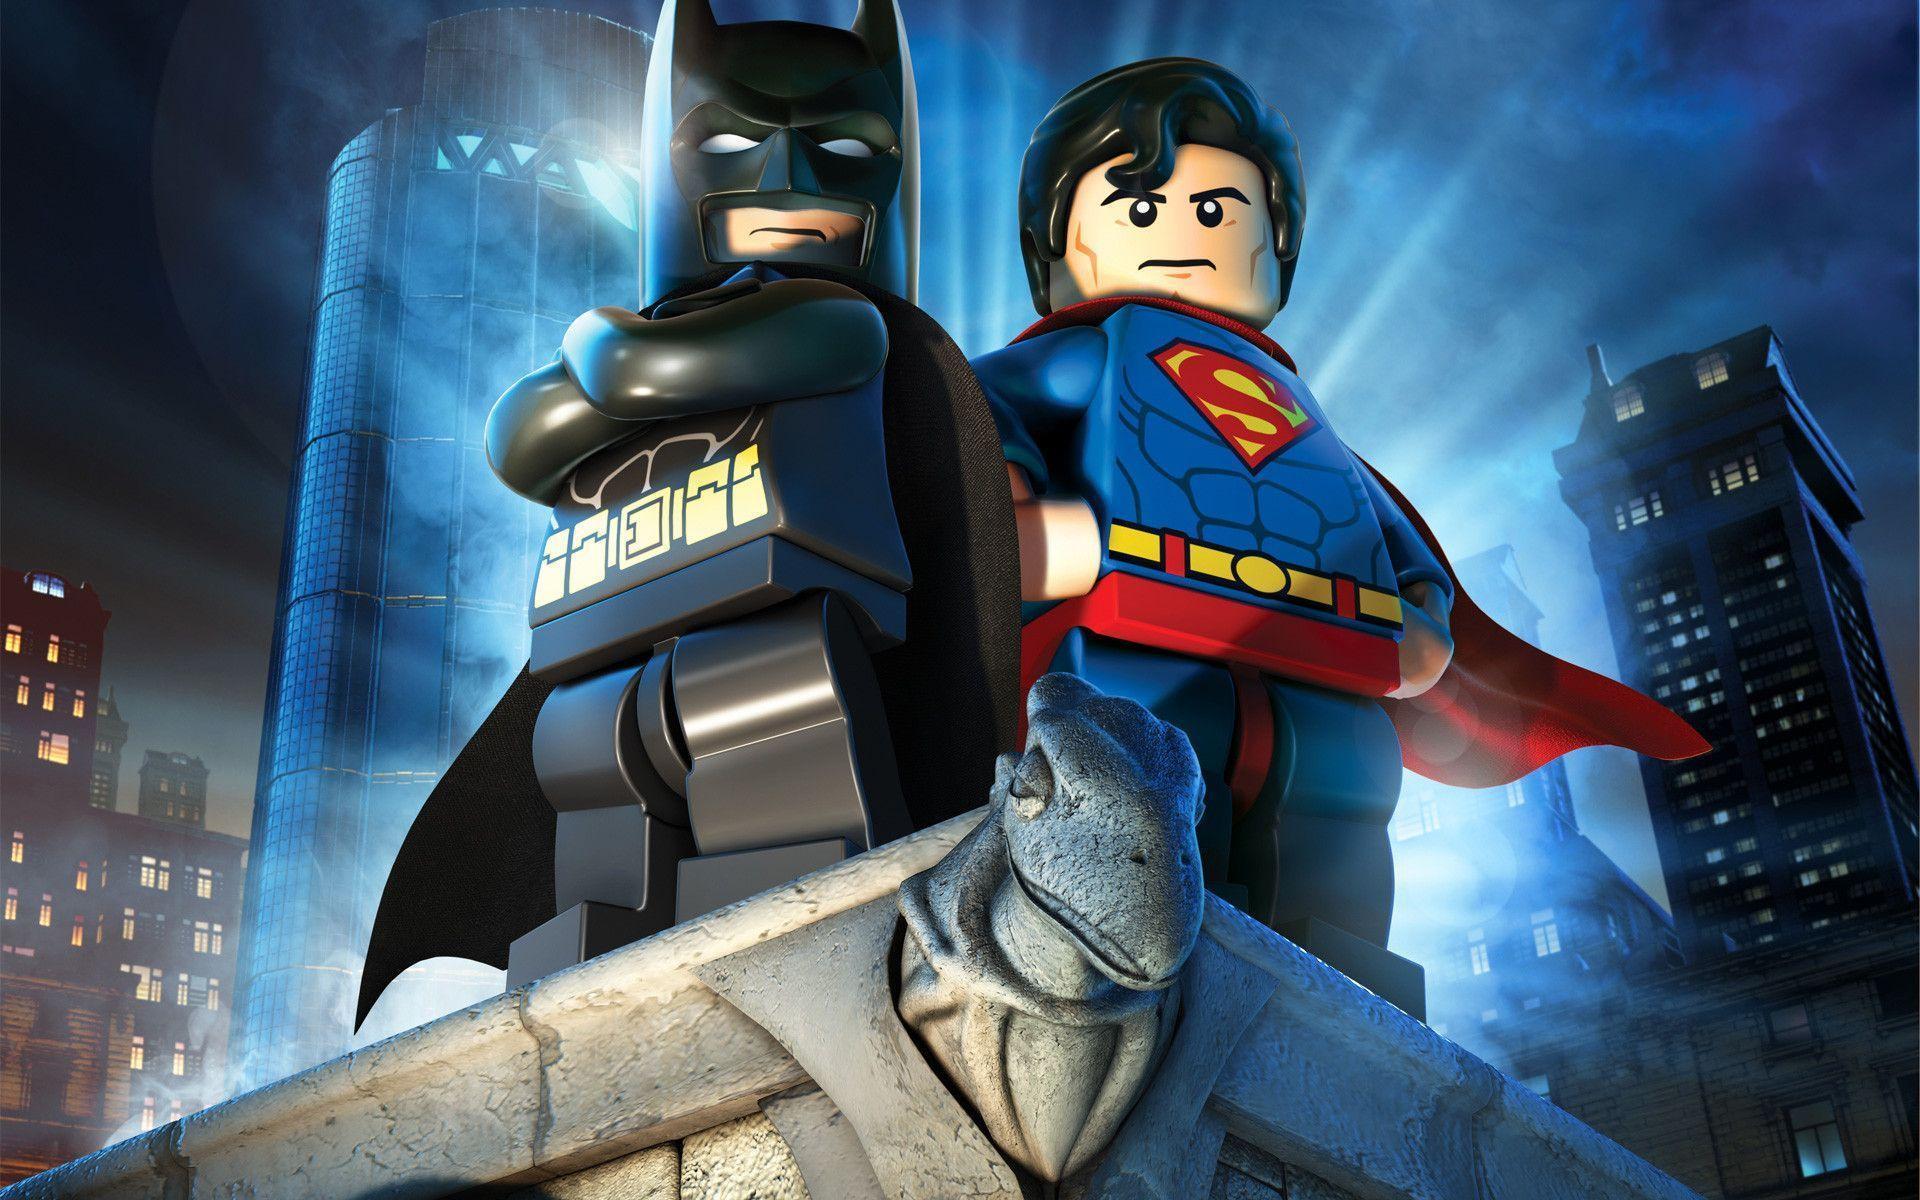 Lego Superheroes Wallpapers  Wallpaper Cave